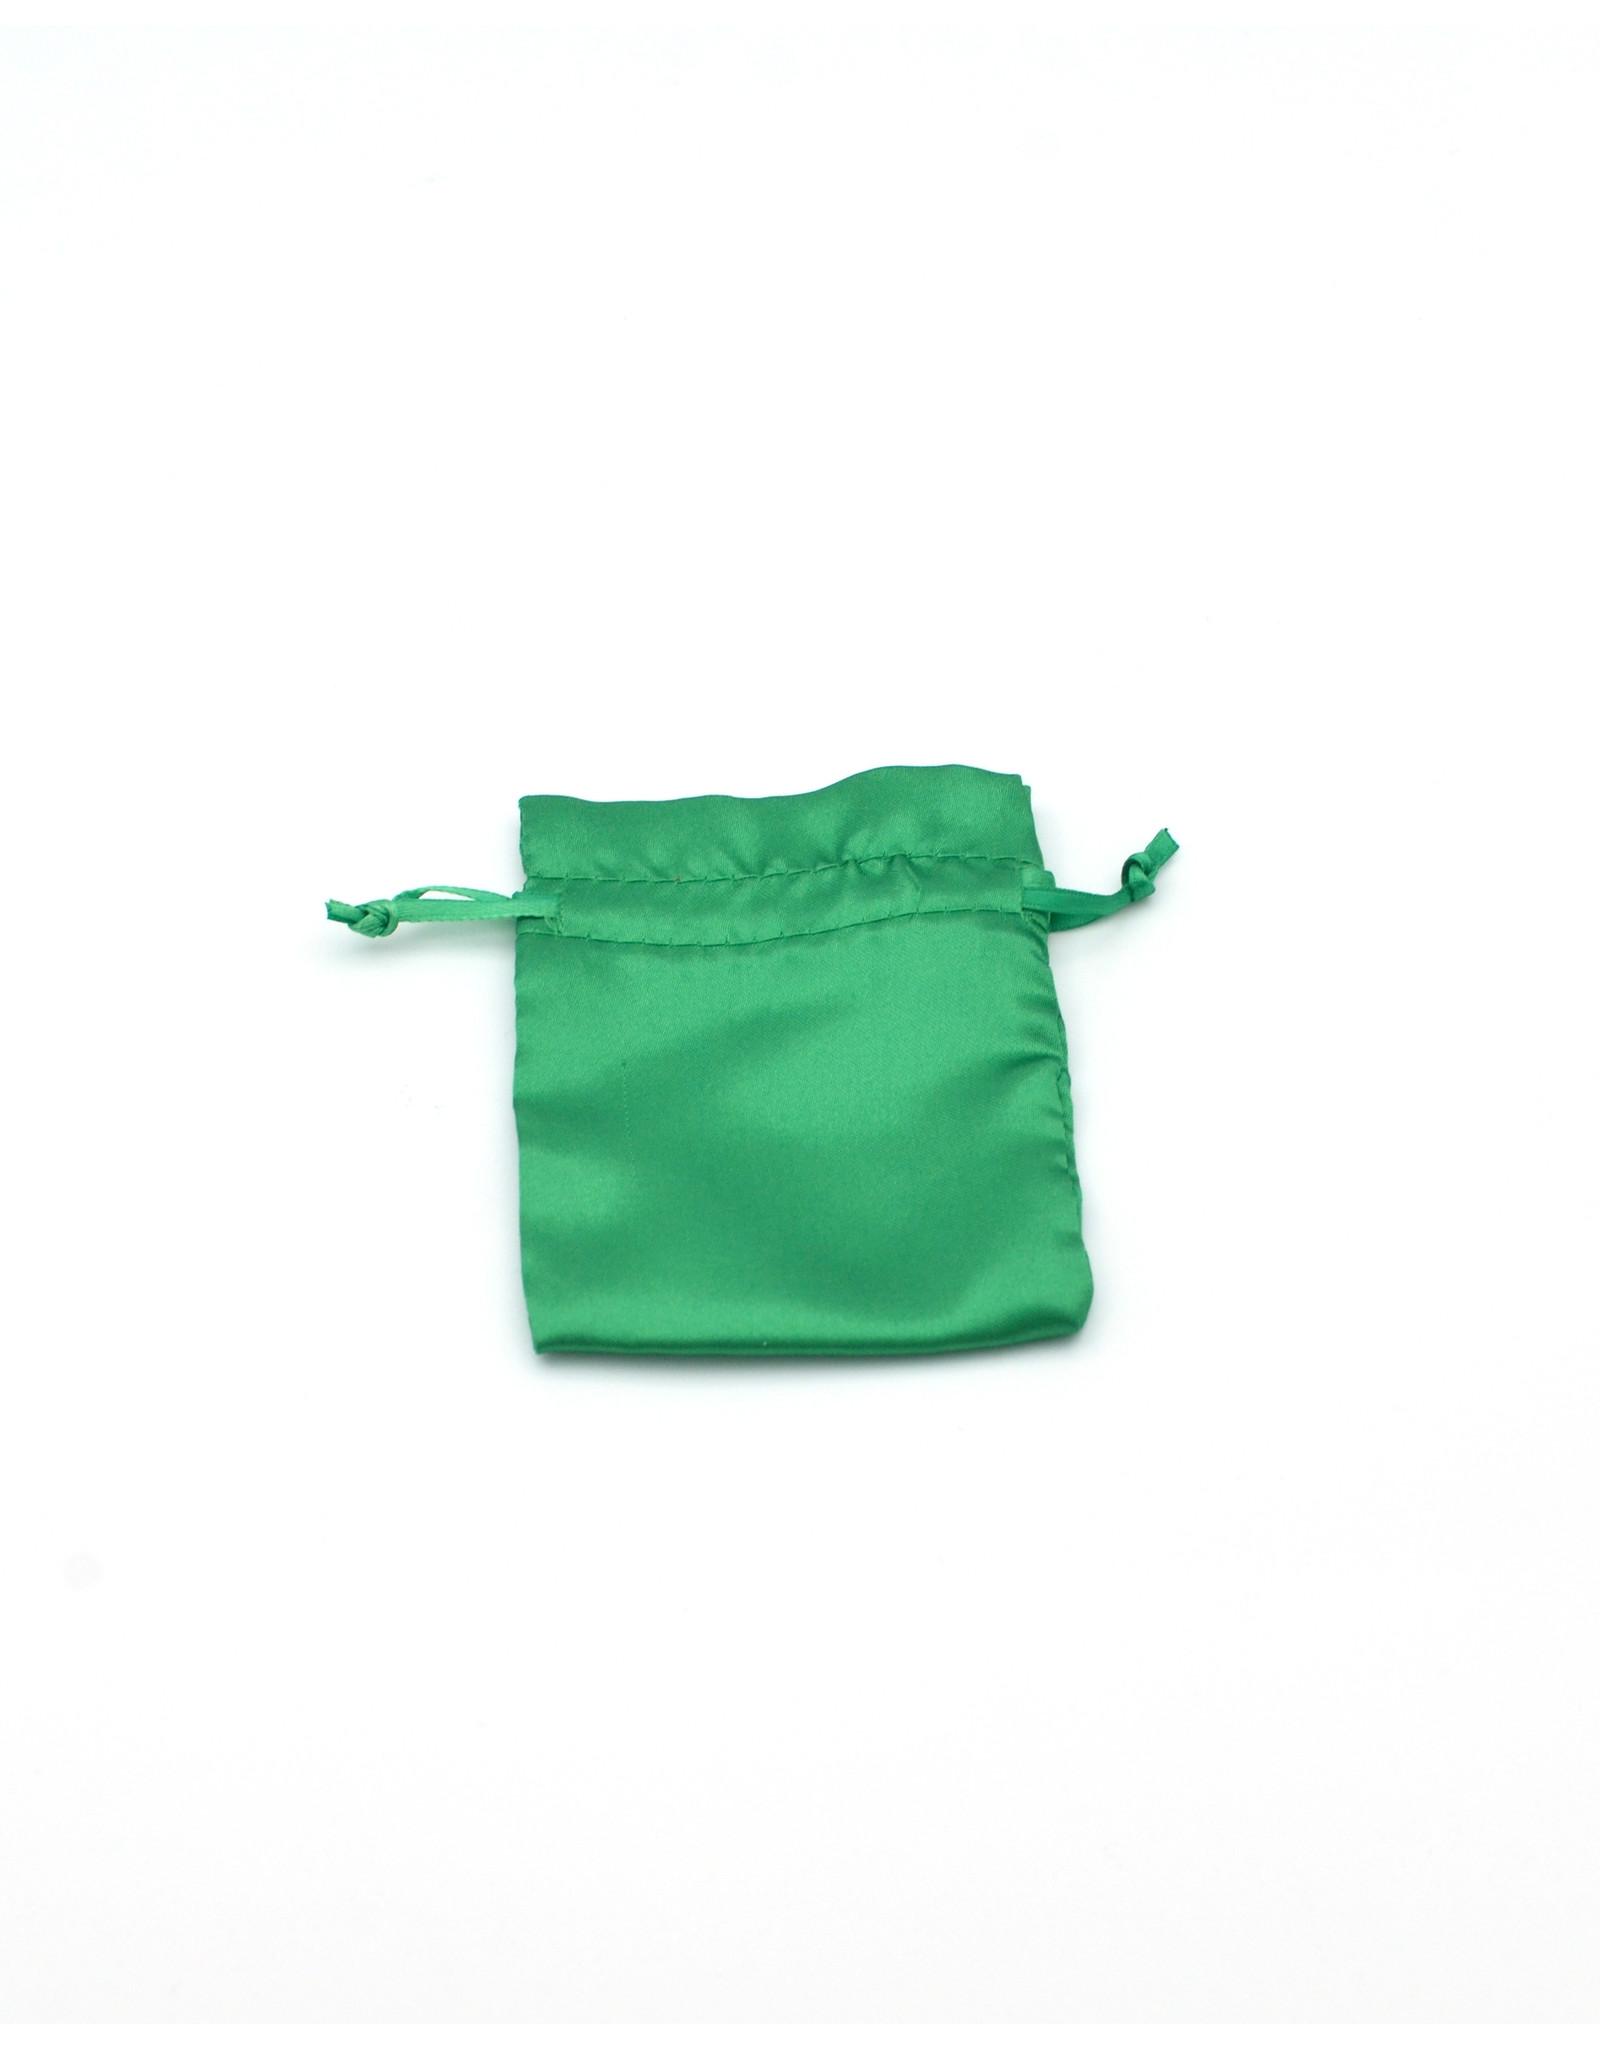 Emerald Green Venus Charm Bag